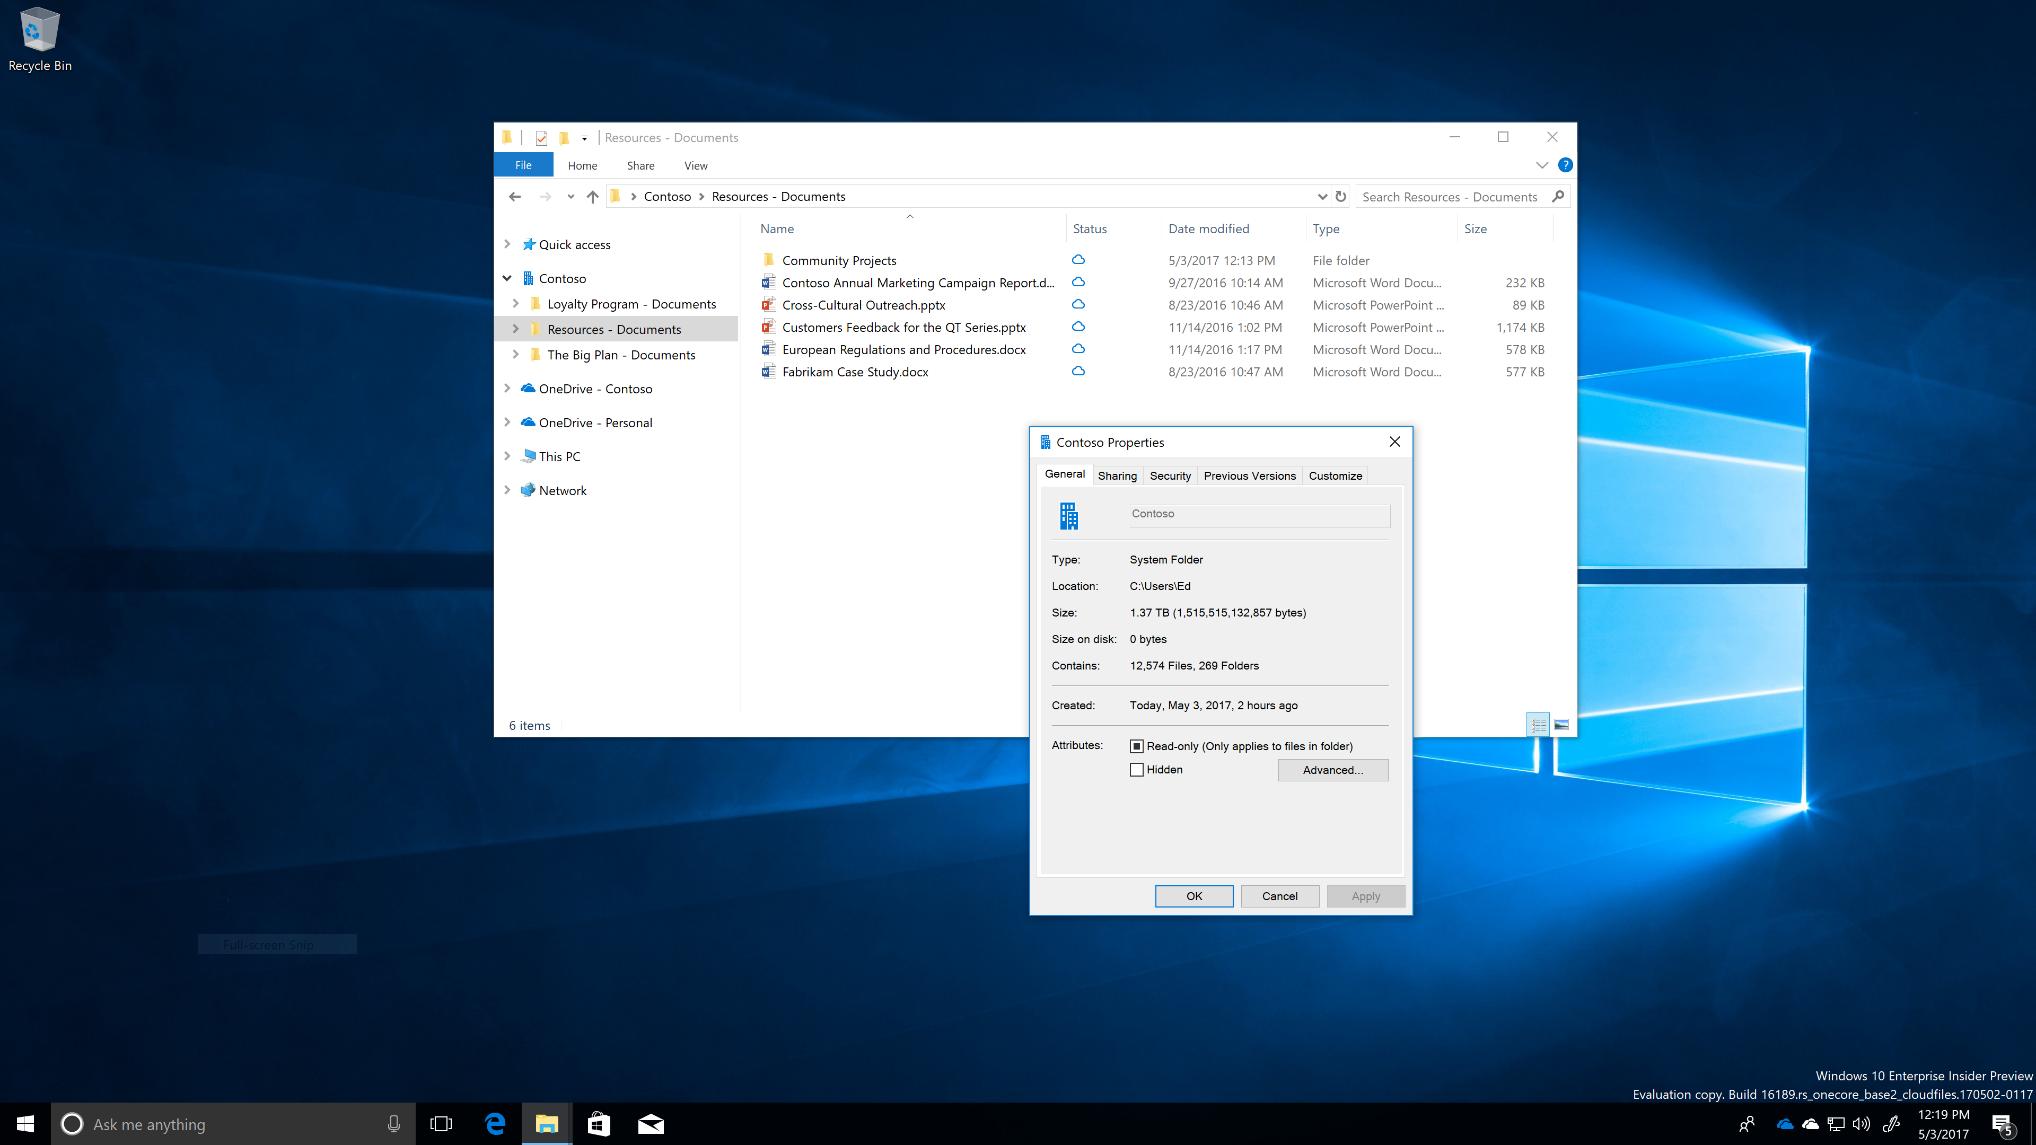 OneDrive Files On-Demand For The Enterprise - Microsoft Tech